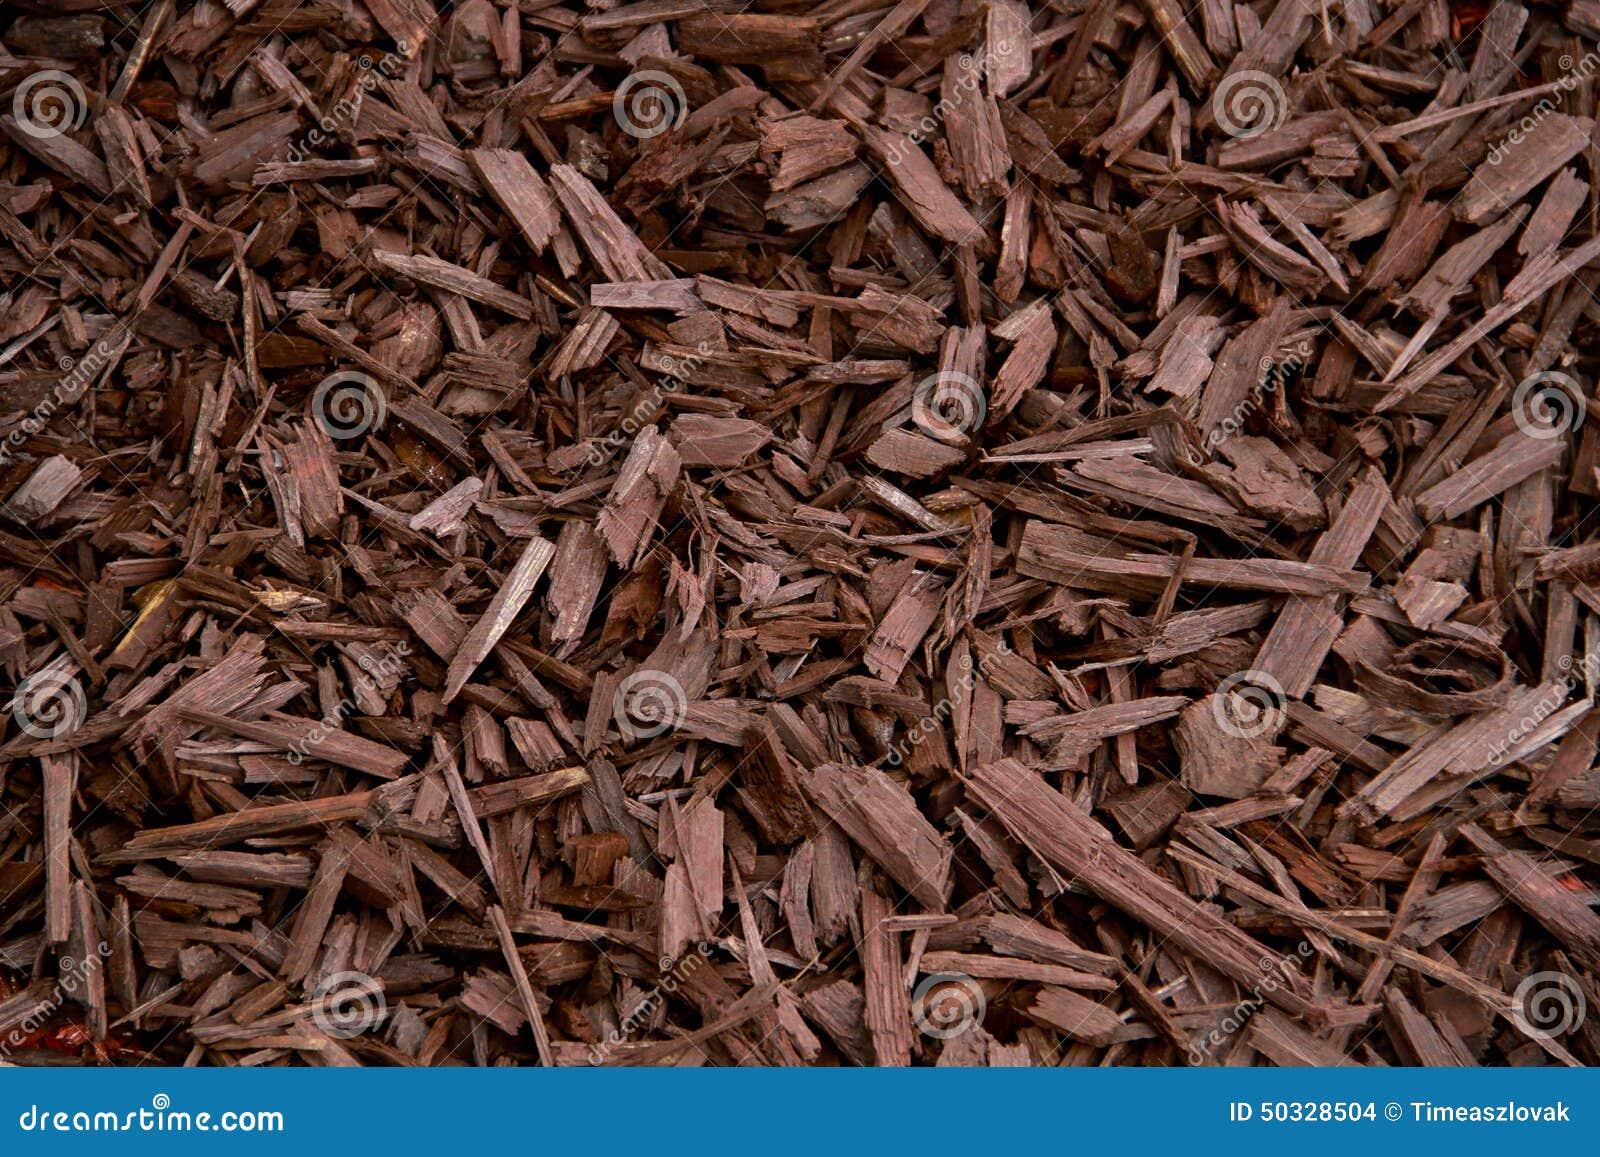 Mulch Brown Decorative Bark Stock Photo - Image: 50328504